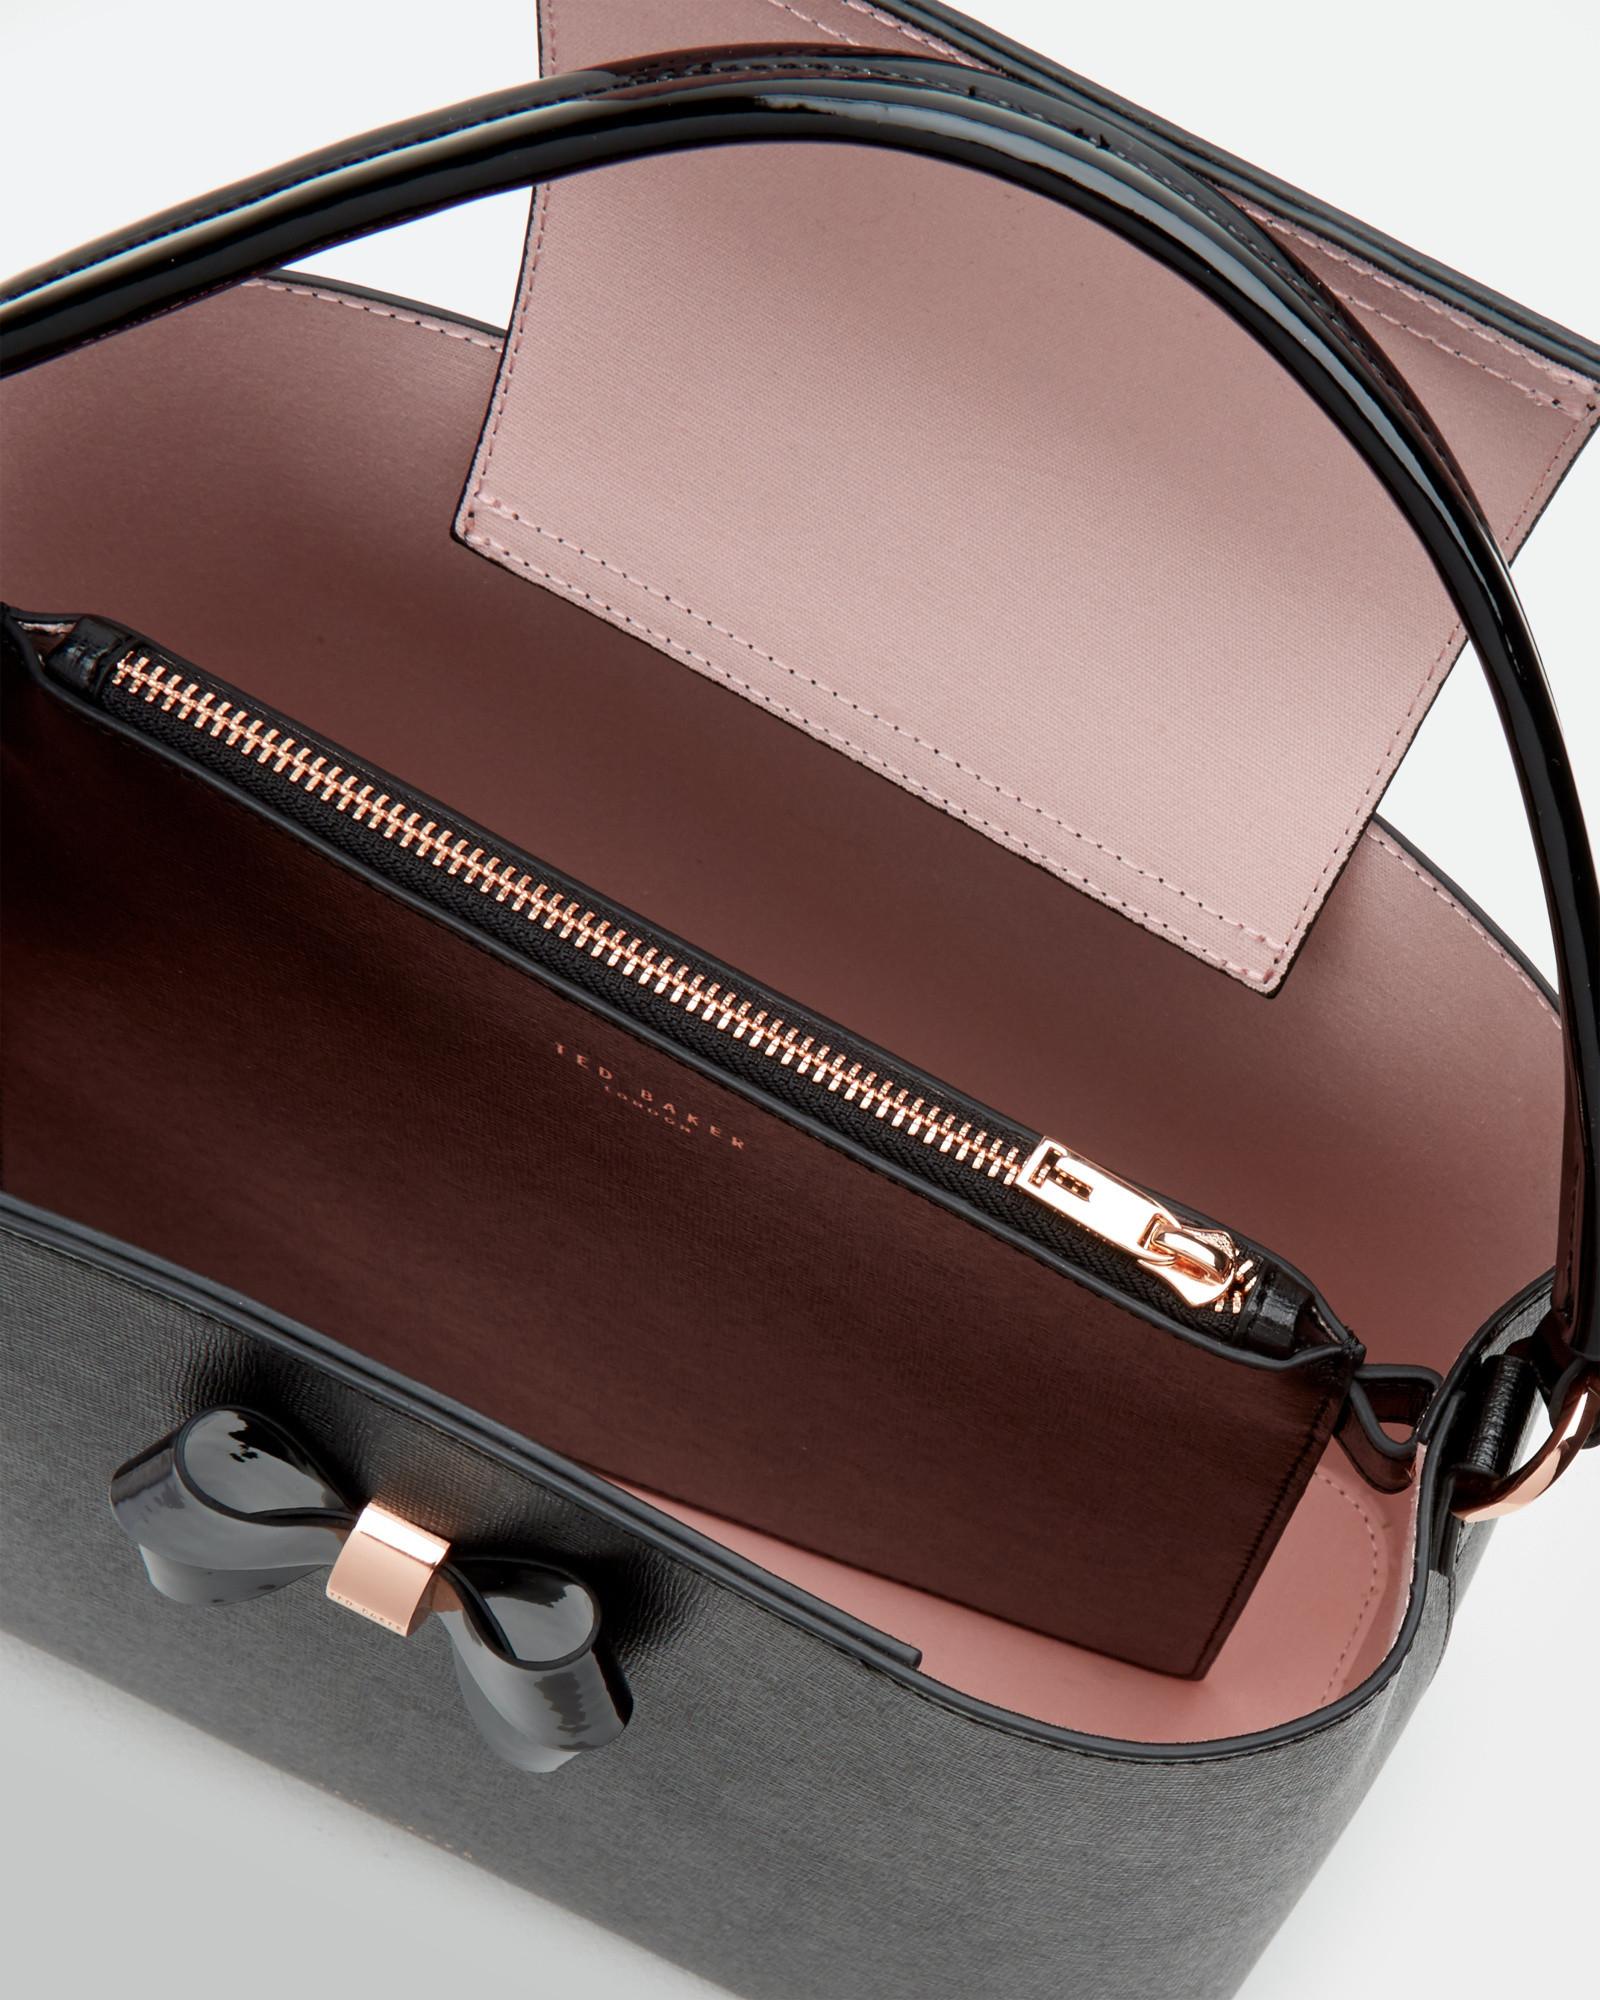 da6555a2f660b8 Lyst Ted Baker Crosshatch Leather Tote Bag In Black ...